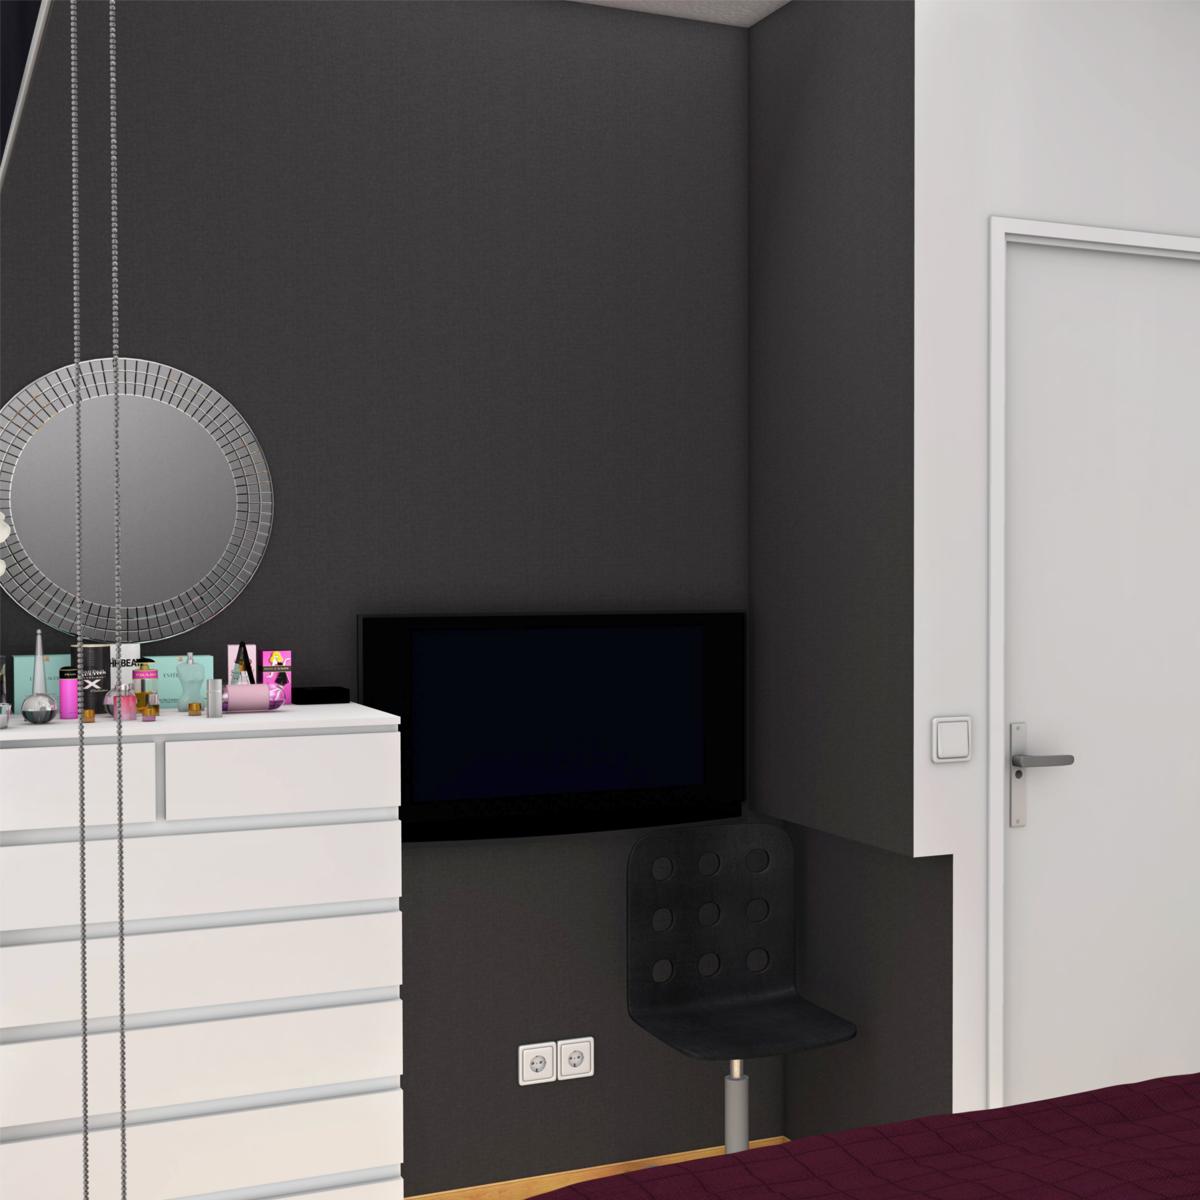 guļamistaba 8 3d modelis 3ds max fbx c4d ma mb obj 159553